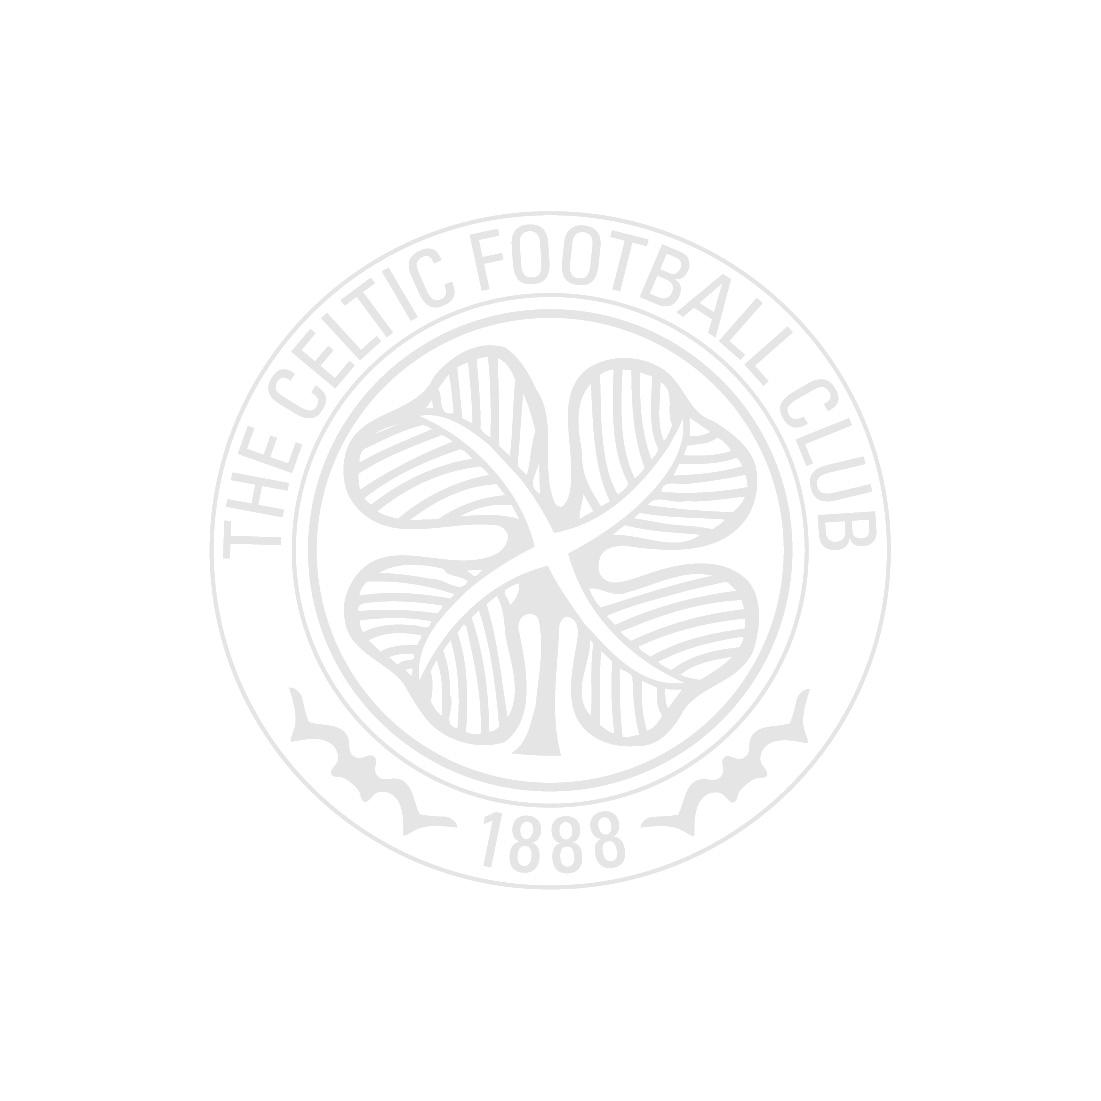 Celtic Ultimate Top - Black